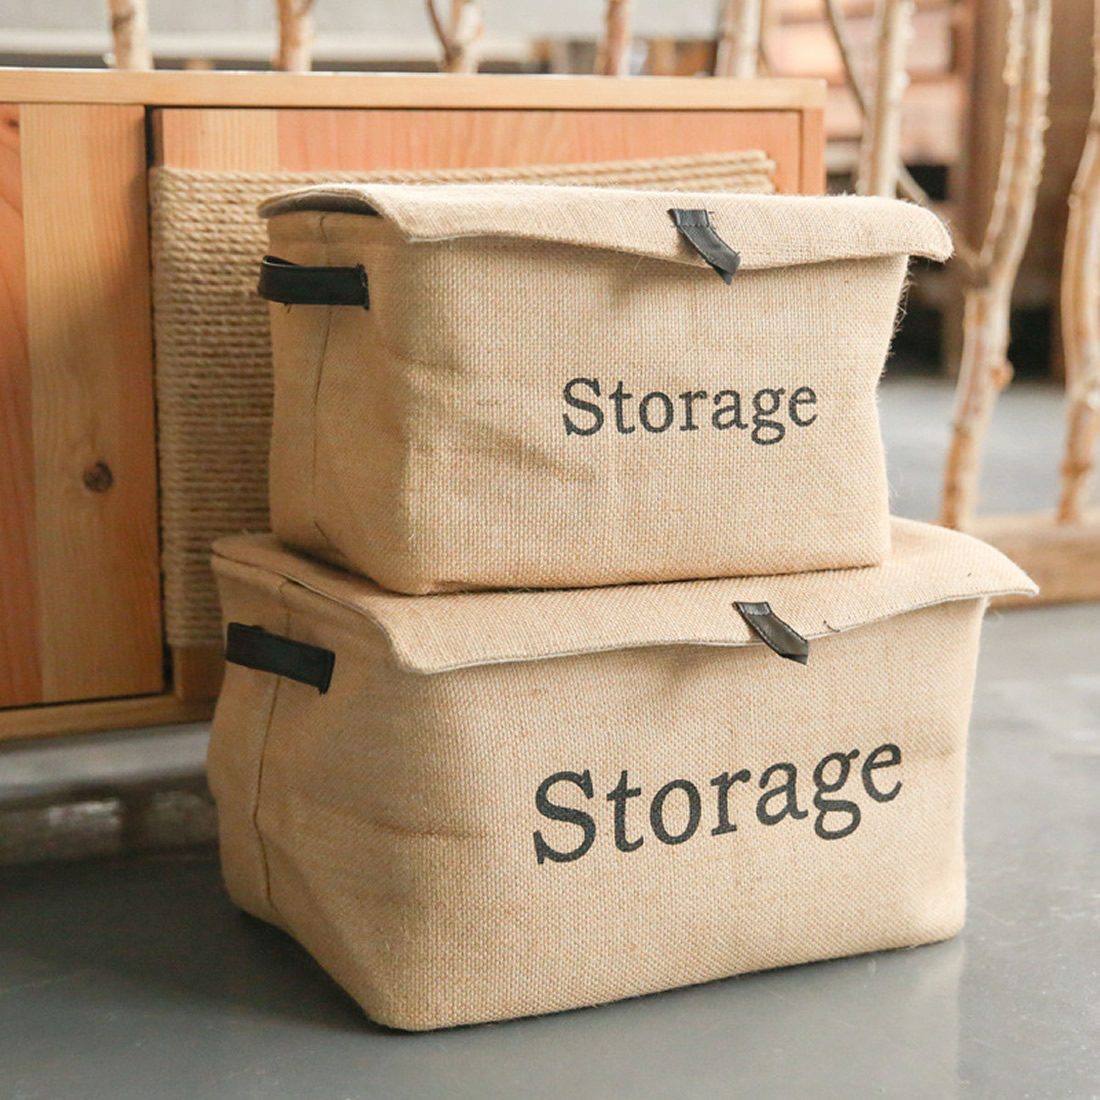 1pcs Cotton Fabric Storage Baskets Creative Clothing Toys Basket Debris Finishing Baskets Home Clothes Storage Organization